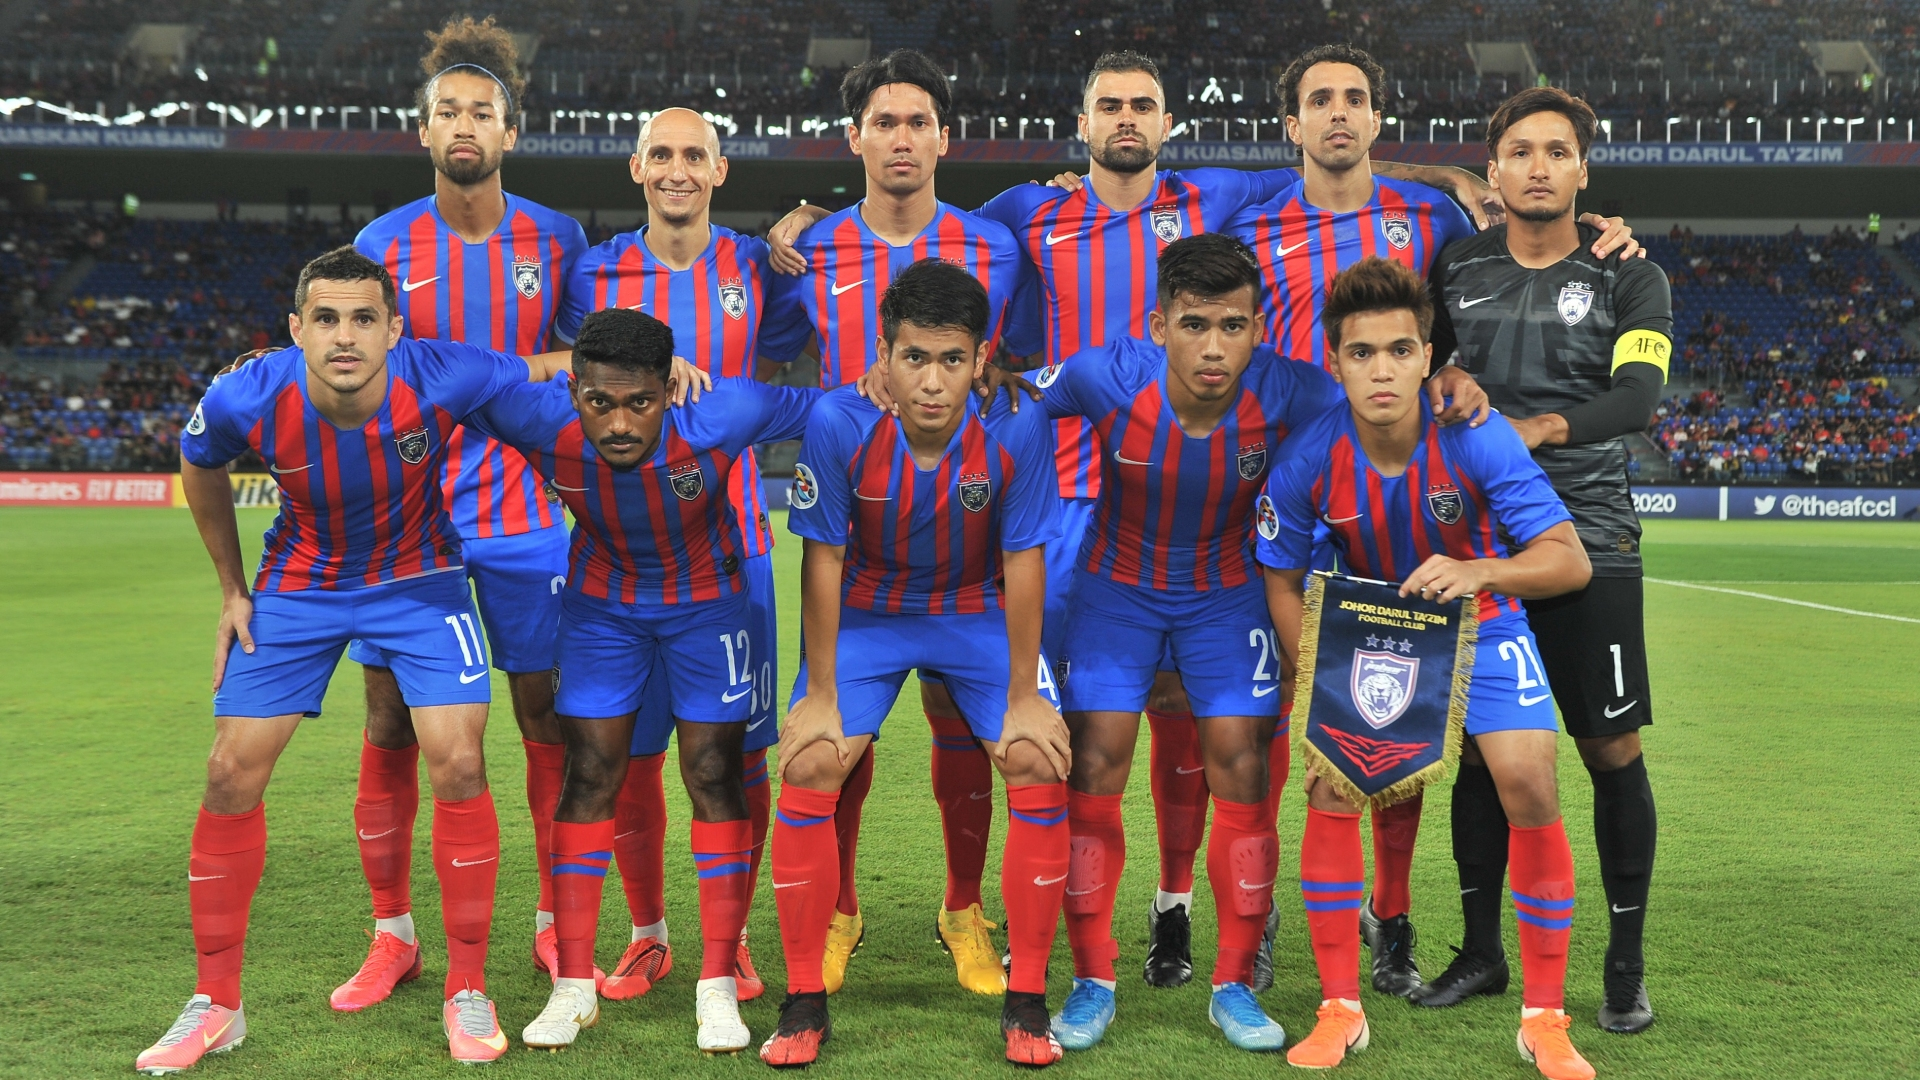 Johor Darul Ta'zim v Suwon Bluewings, AFC Champions League, 3 Mar 2020